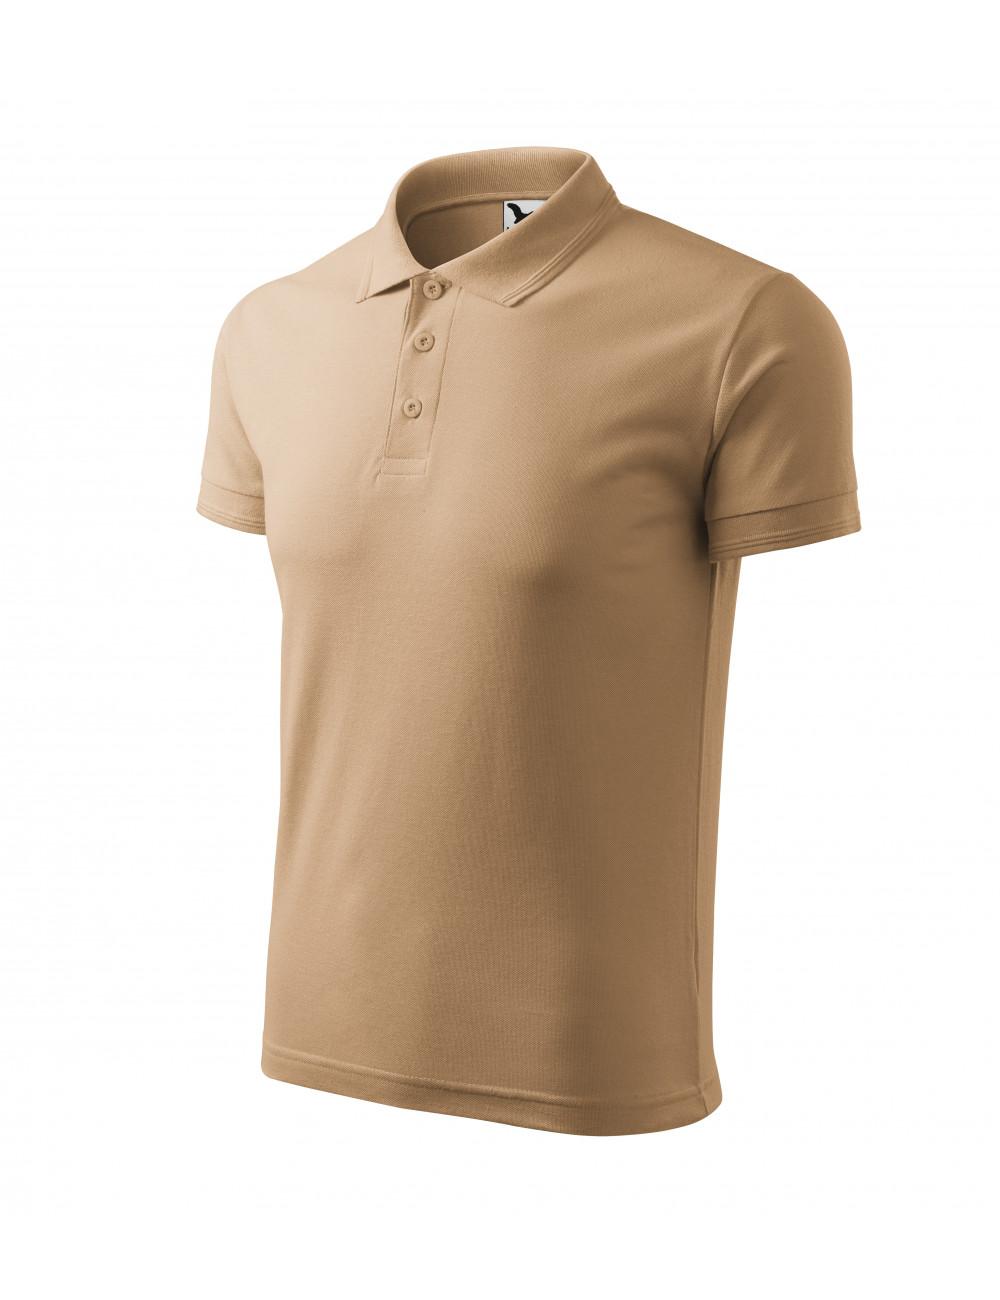 Adler MALFINI Koszulka polo męska Pique Polo 203 piaskowy